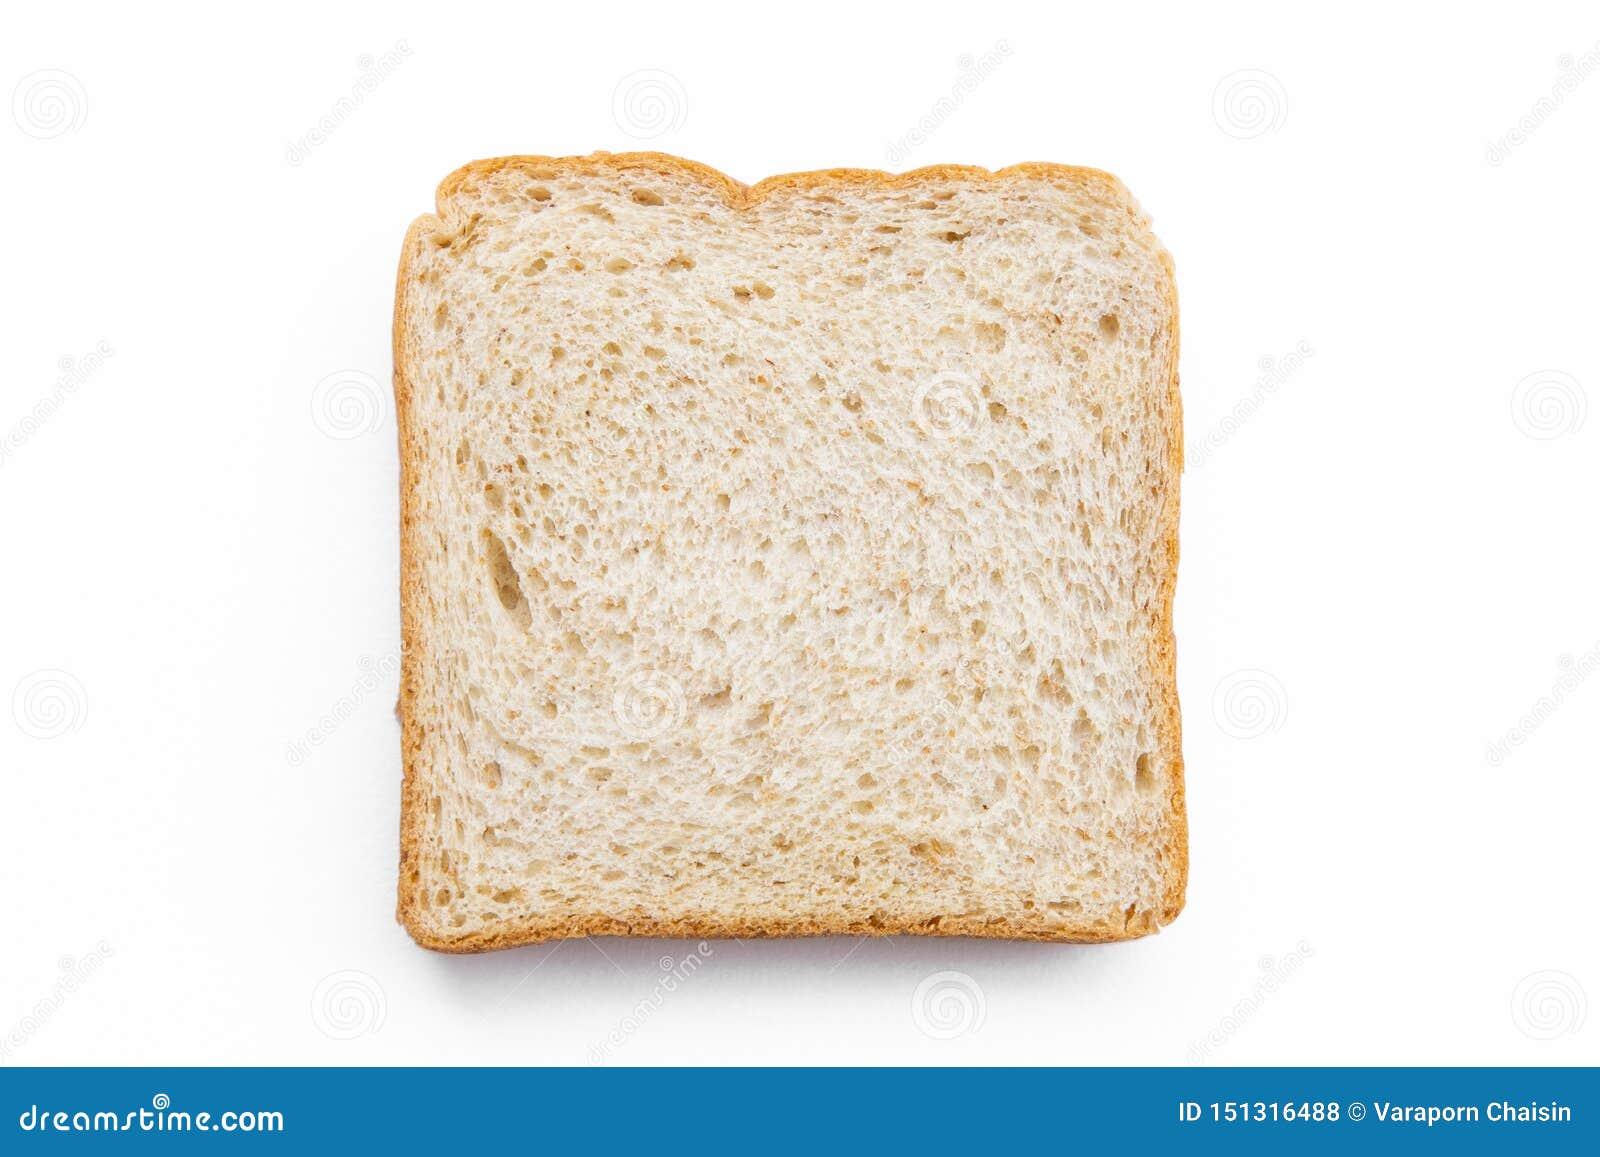 Pane affettato isolato su priorit? bassa bianca